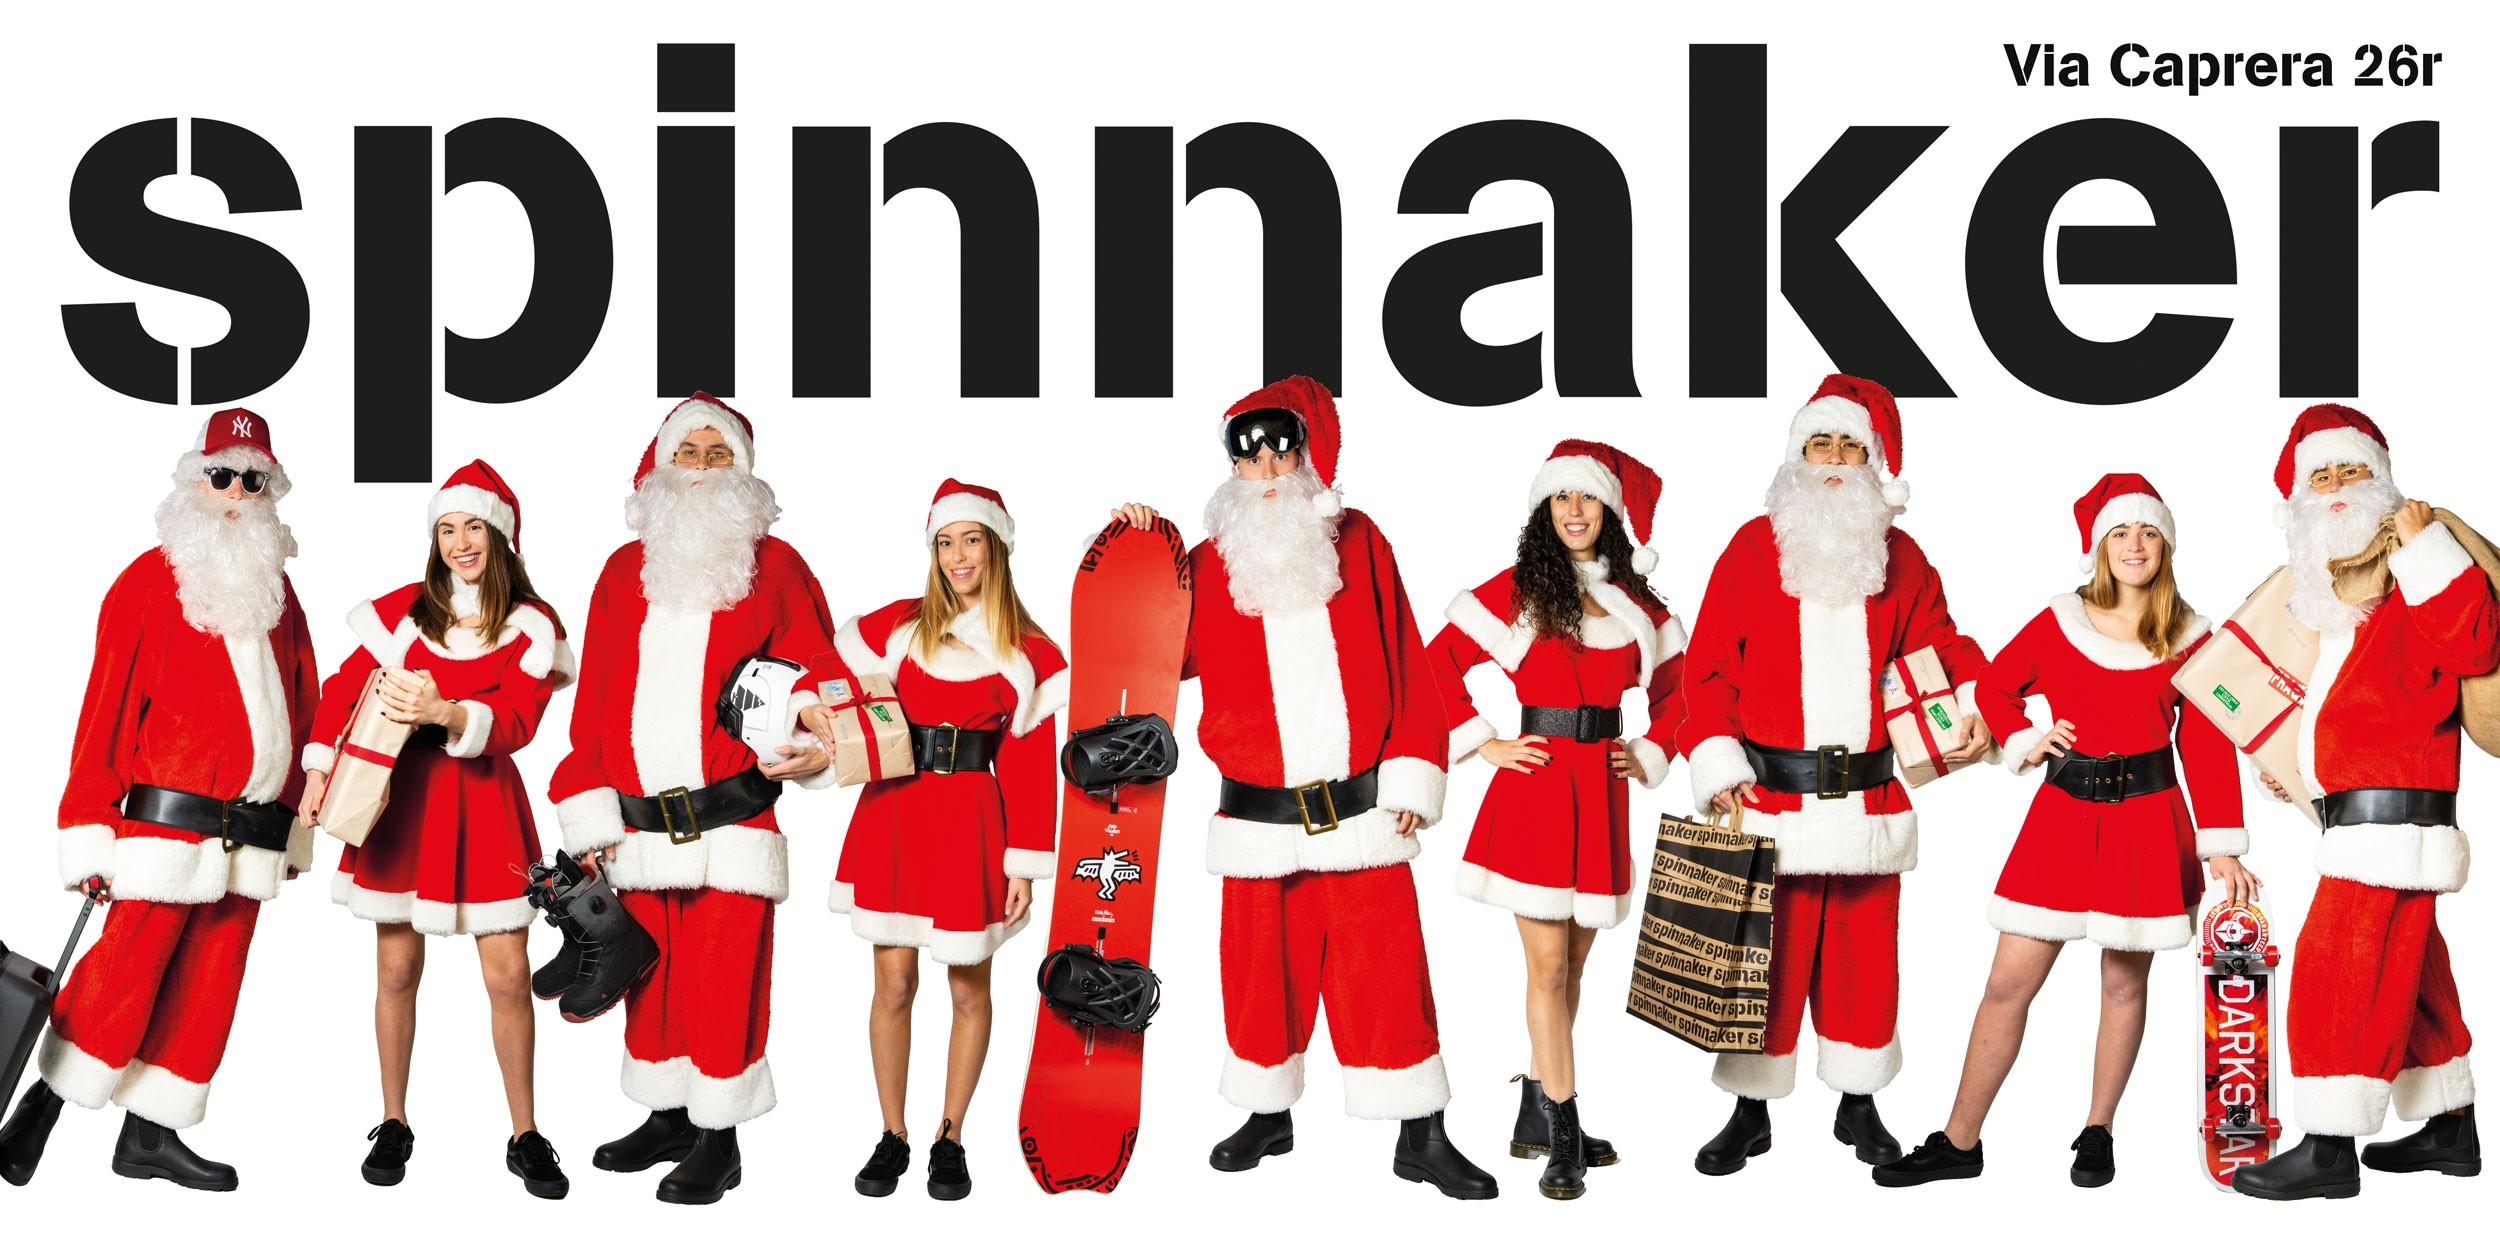 Affissioni Grandi formati per Spinnaker Natale 2019 1